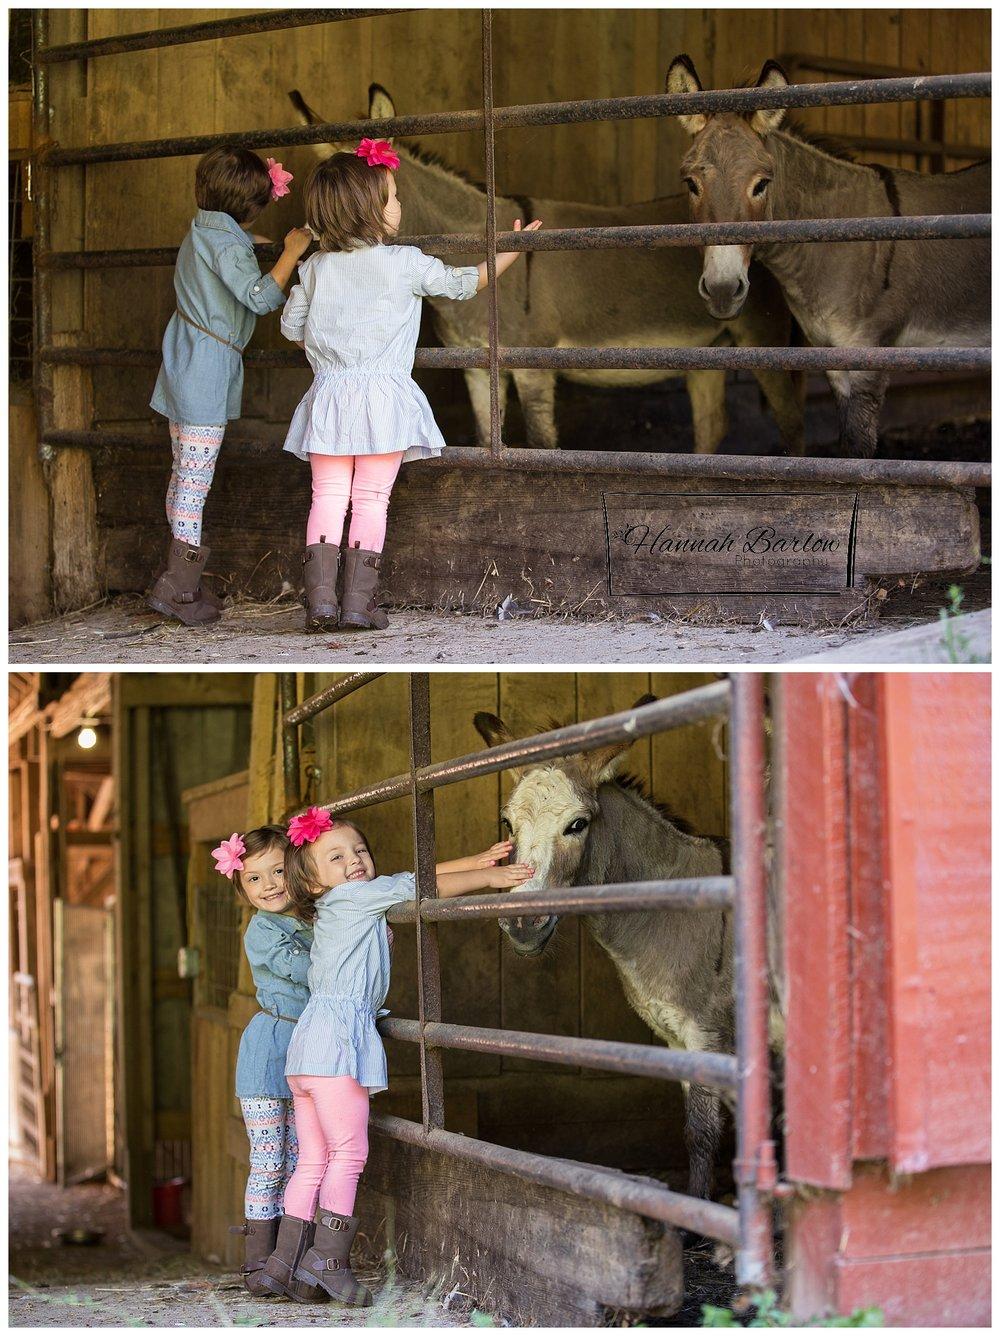 Children's Country Photo Session, Wellsburg, WV